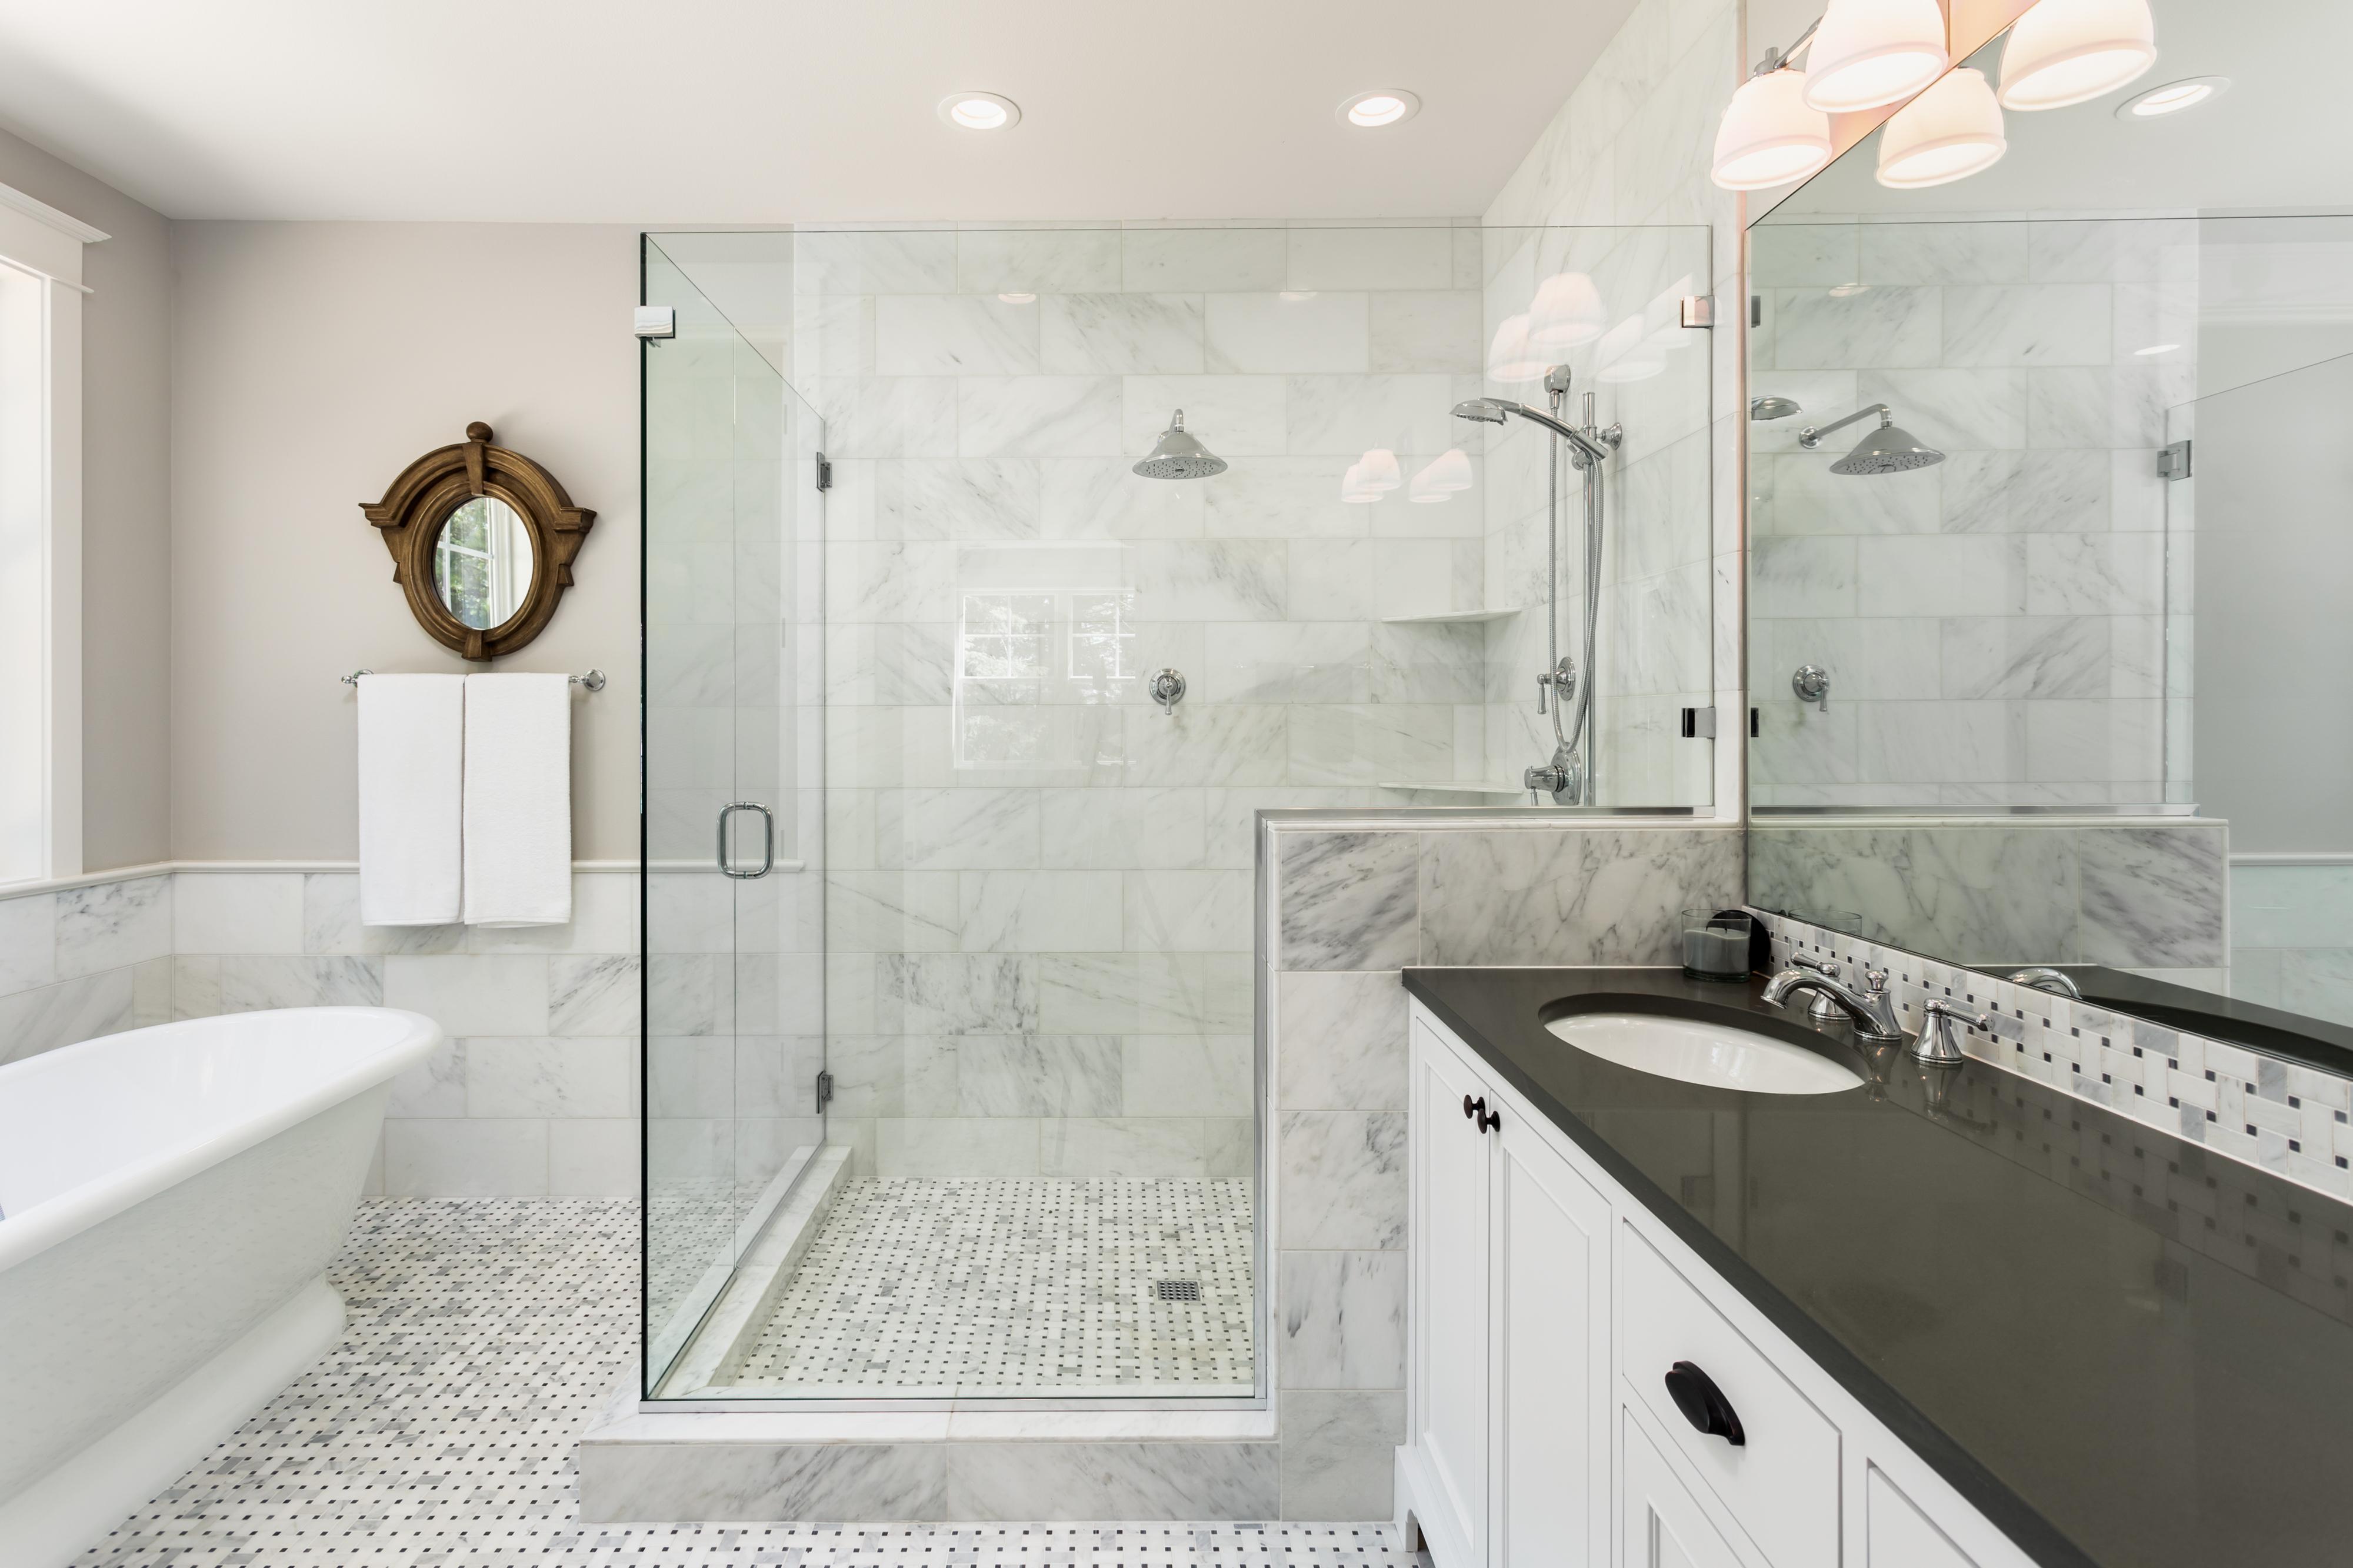 Bathroom - M&D Home Repairs and Remodeling LLC